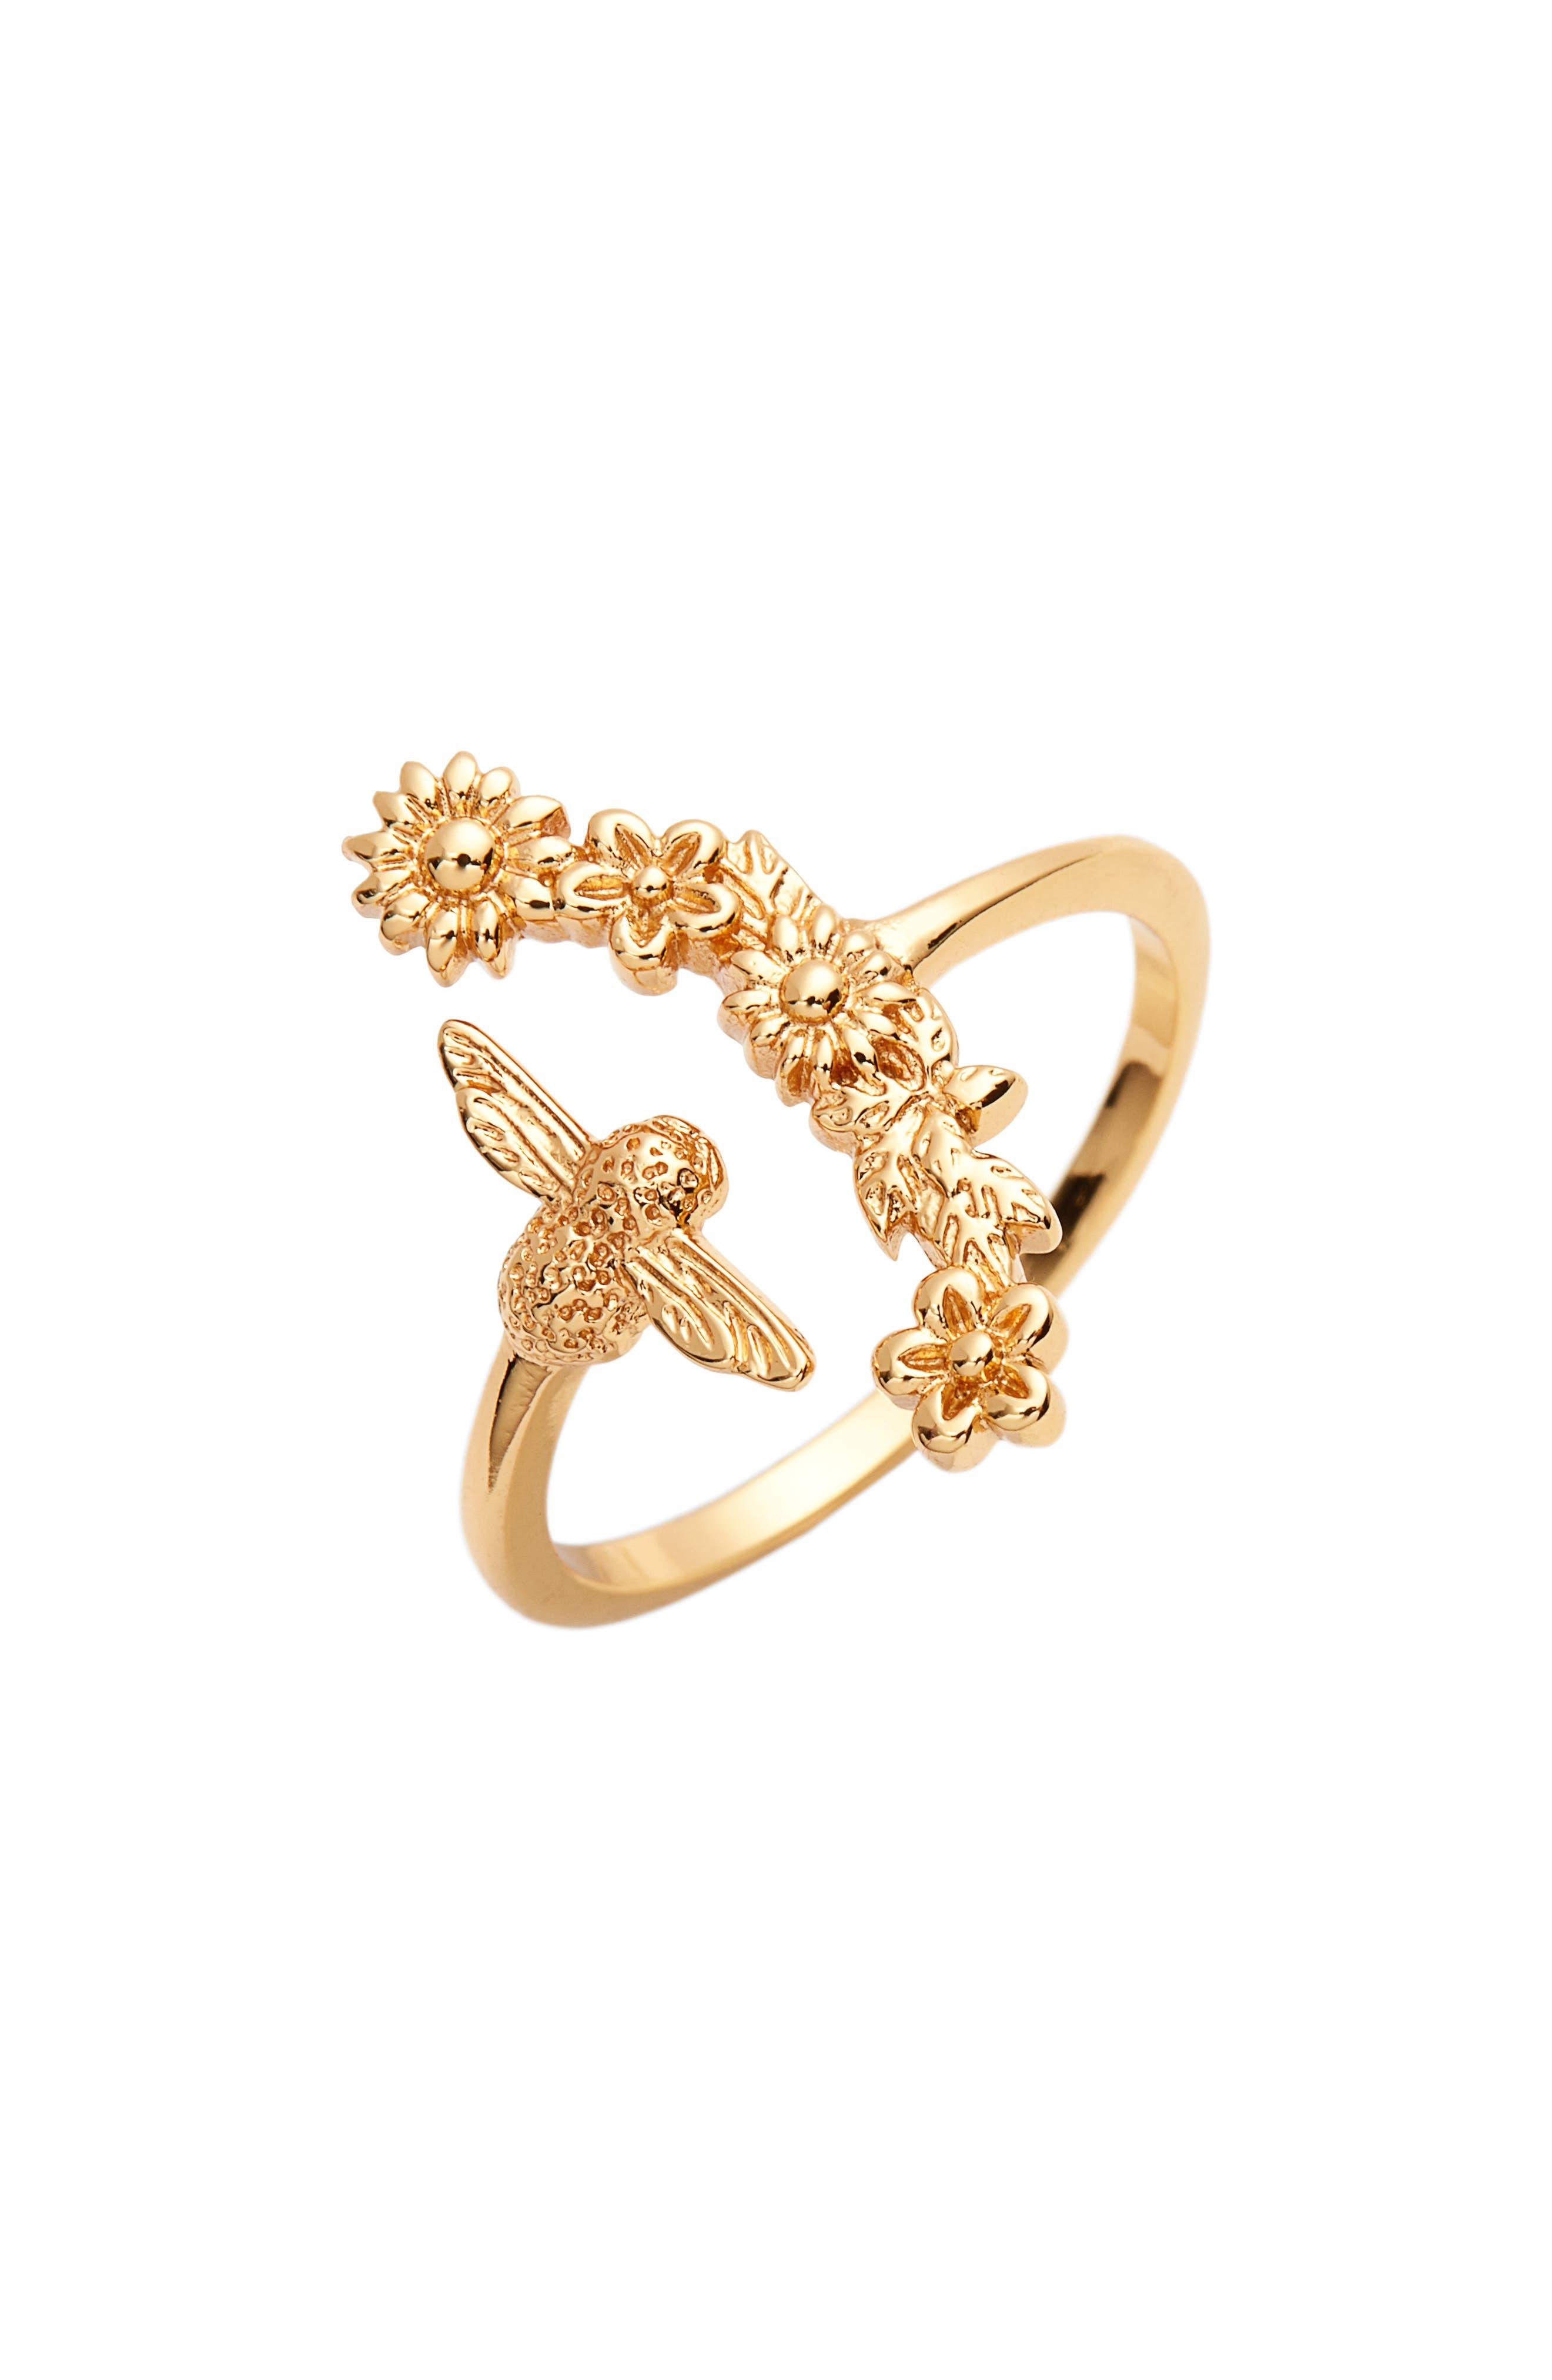 Main Image - Olivia Burton Bee Blooms Ring